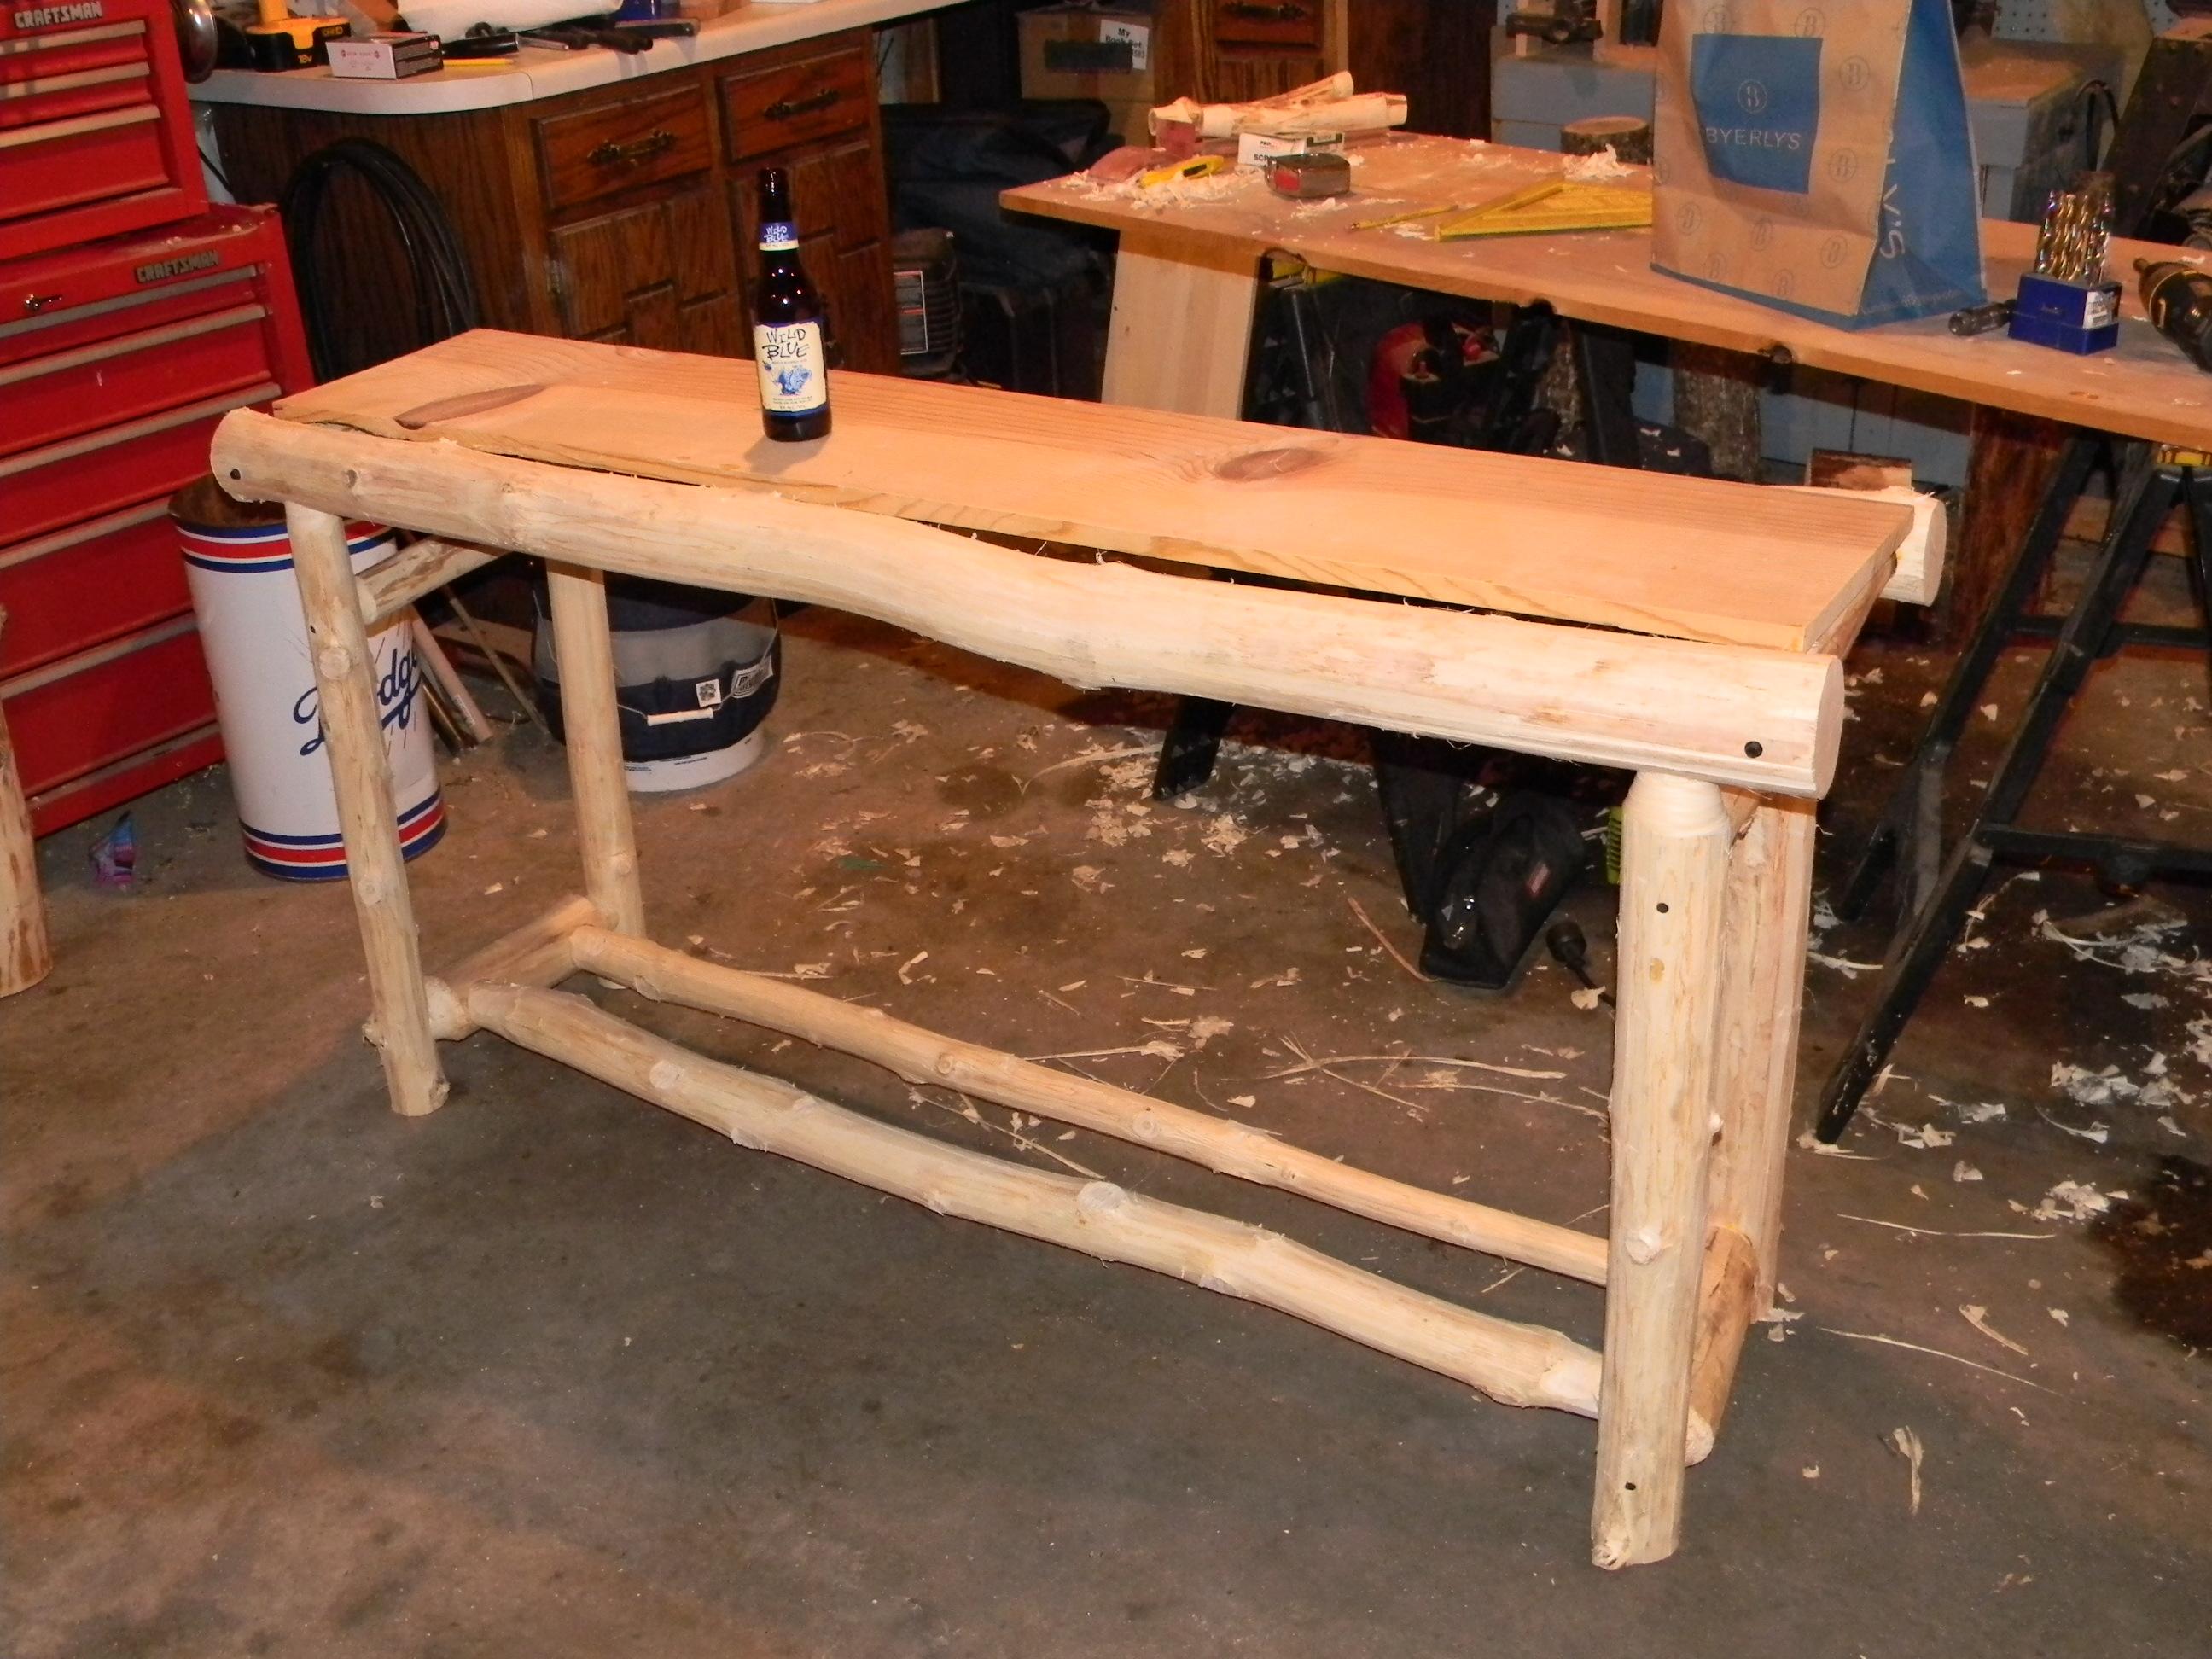 Ordinary Tools For Making Log Furniture #7: Woodworking Log Furniture Making